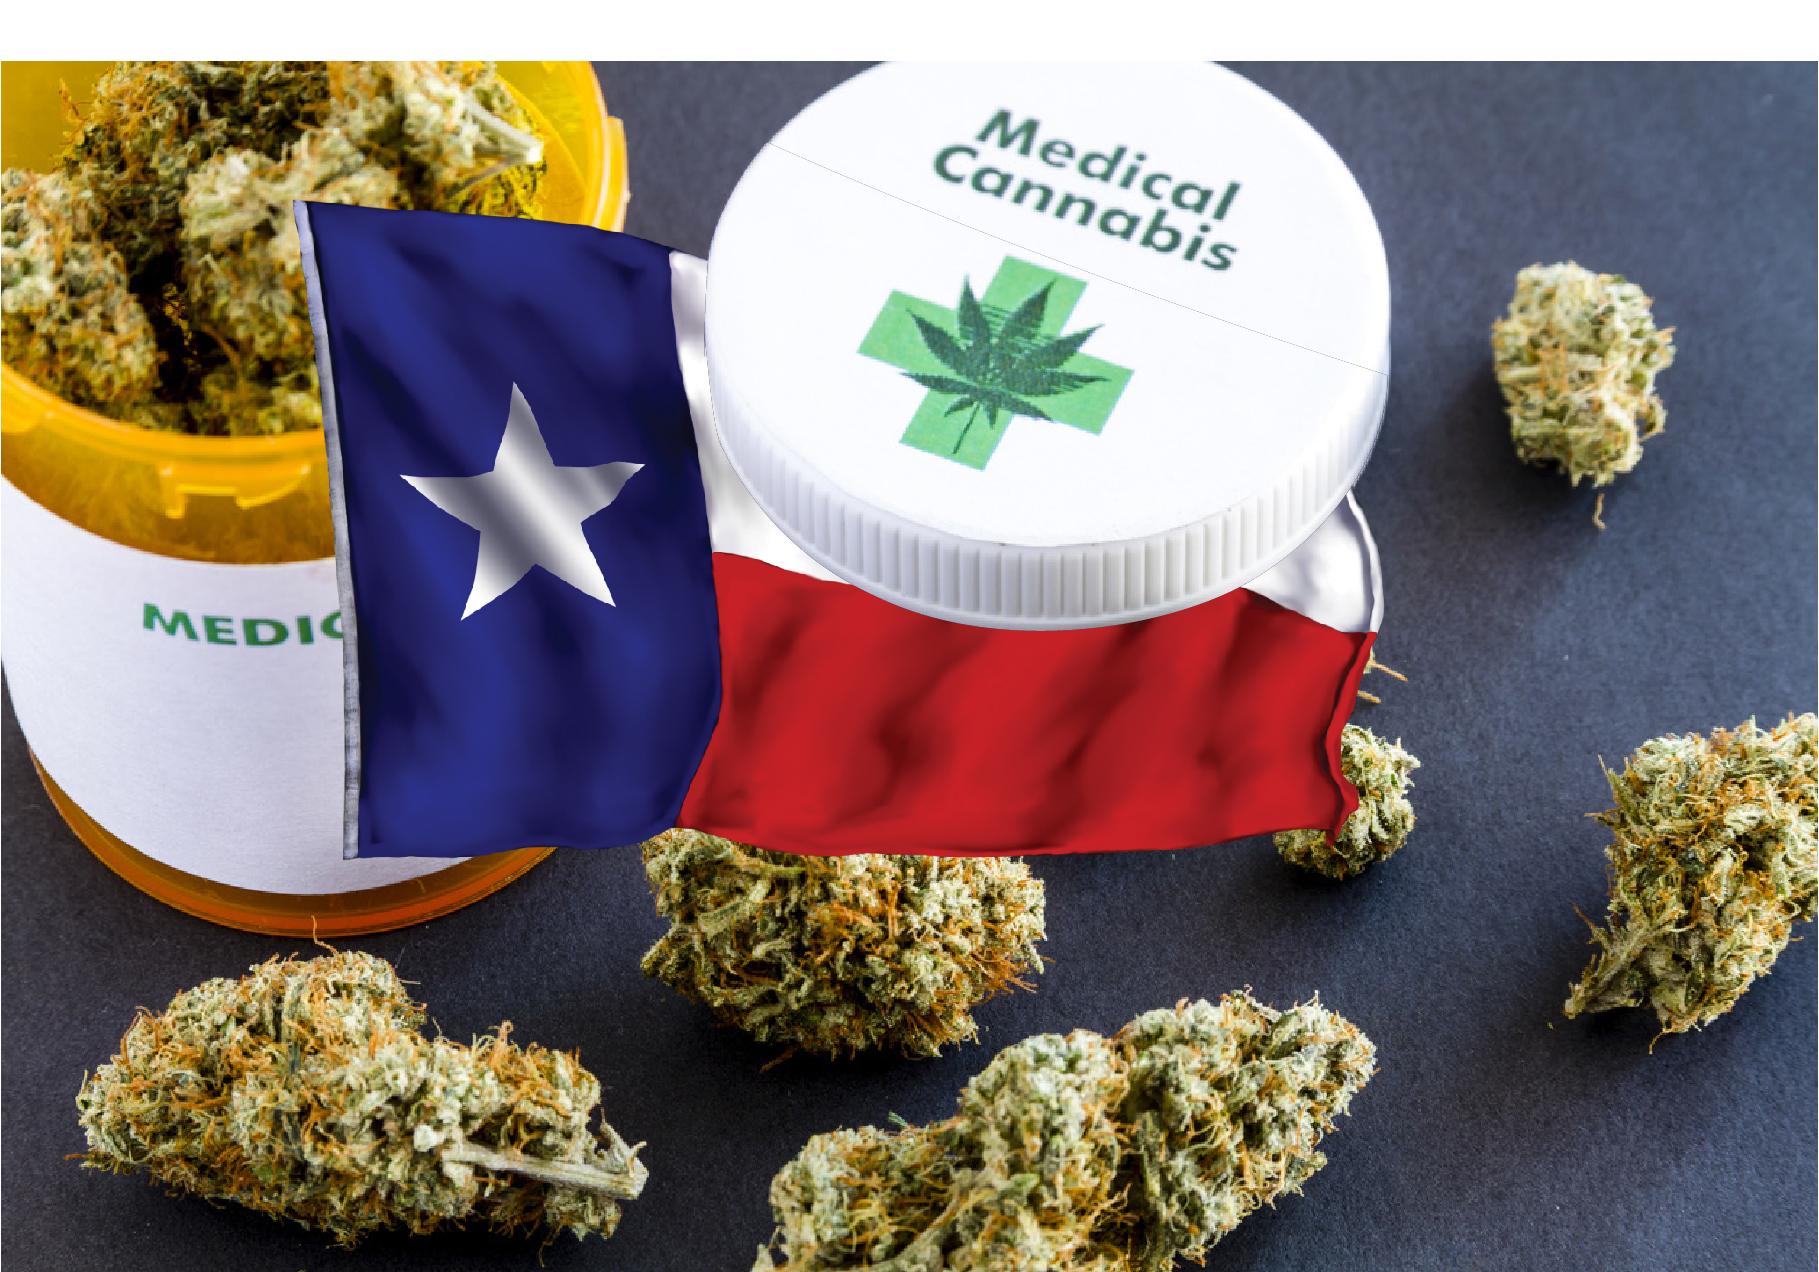 Medical marijuana program in Texas set to expand Wednesday